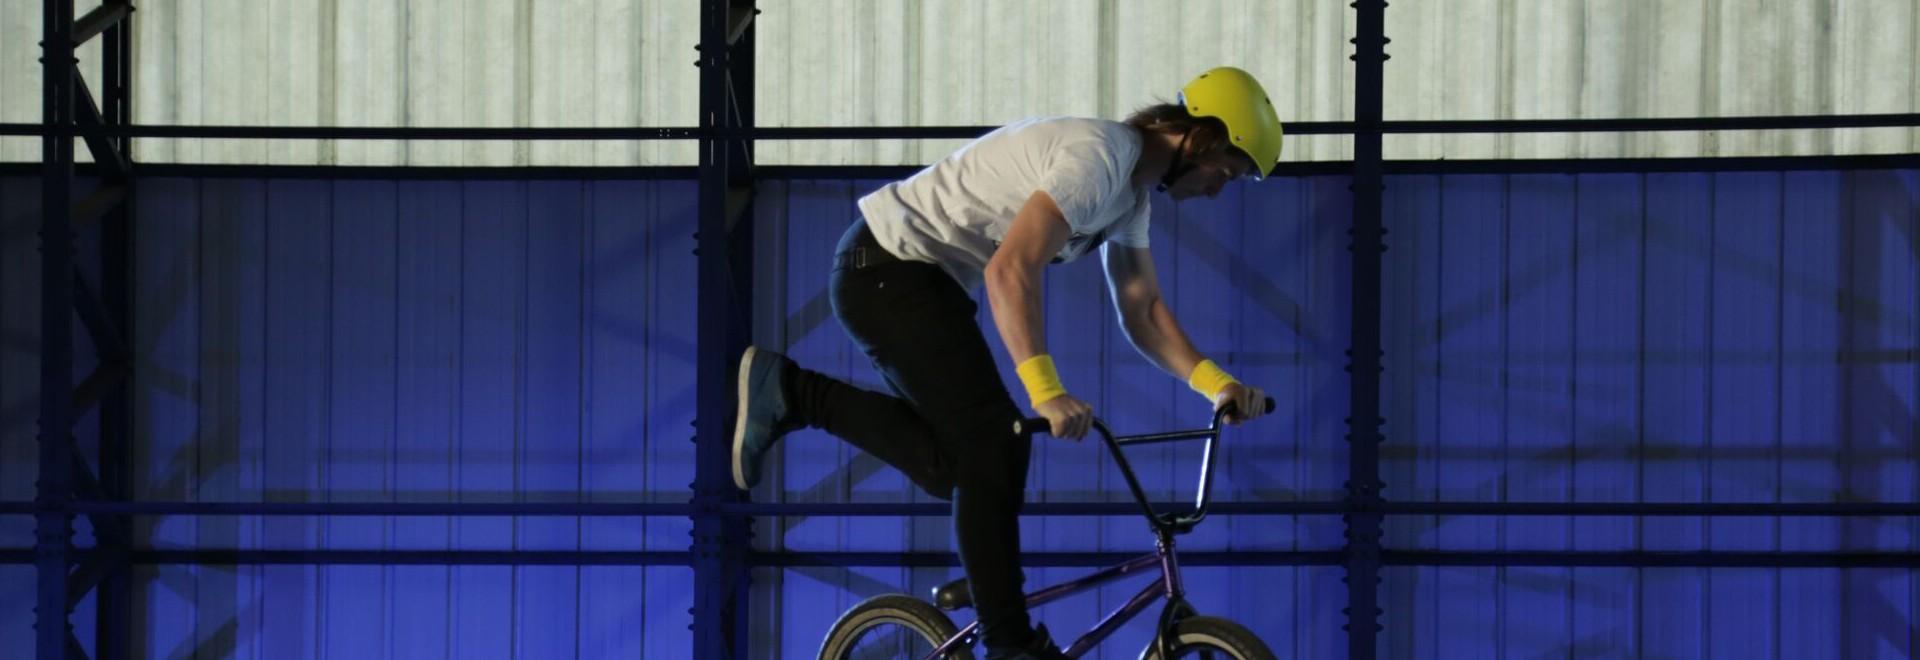 Acrobazie in bici